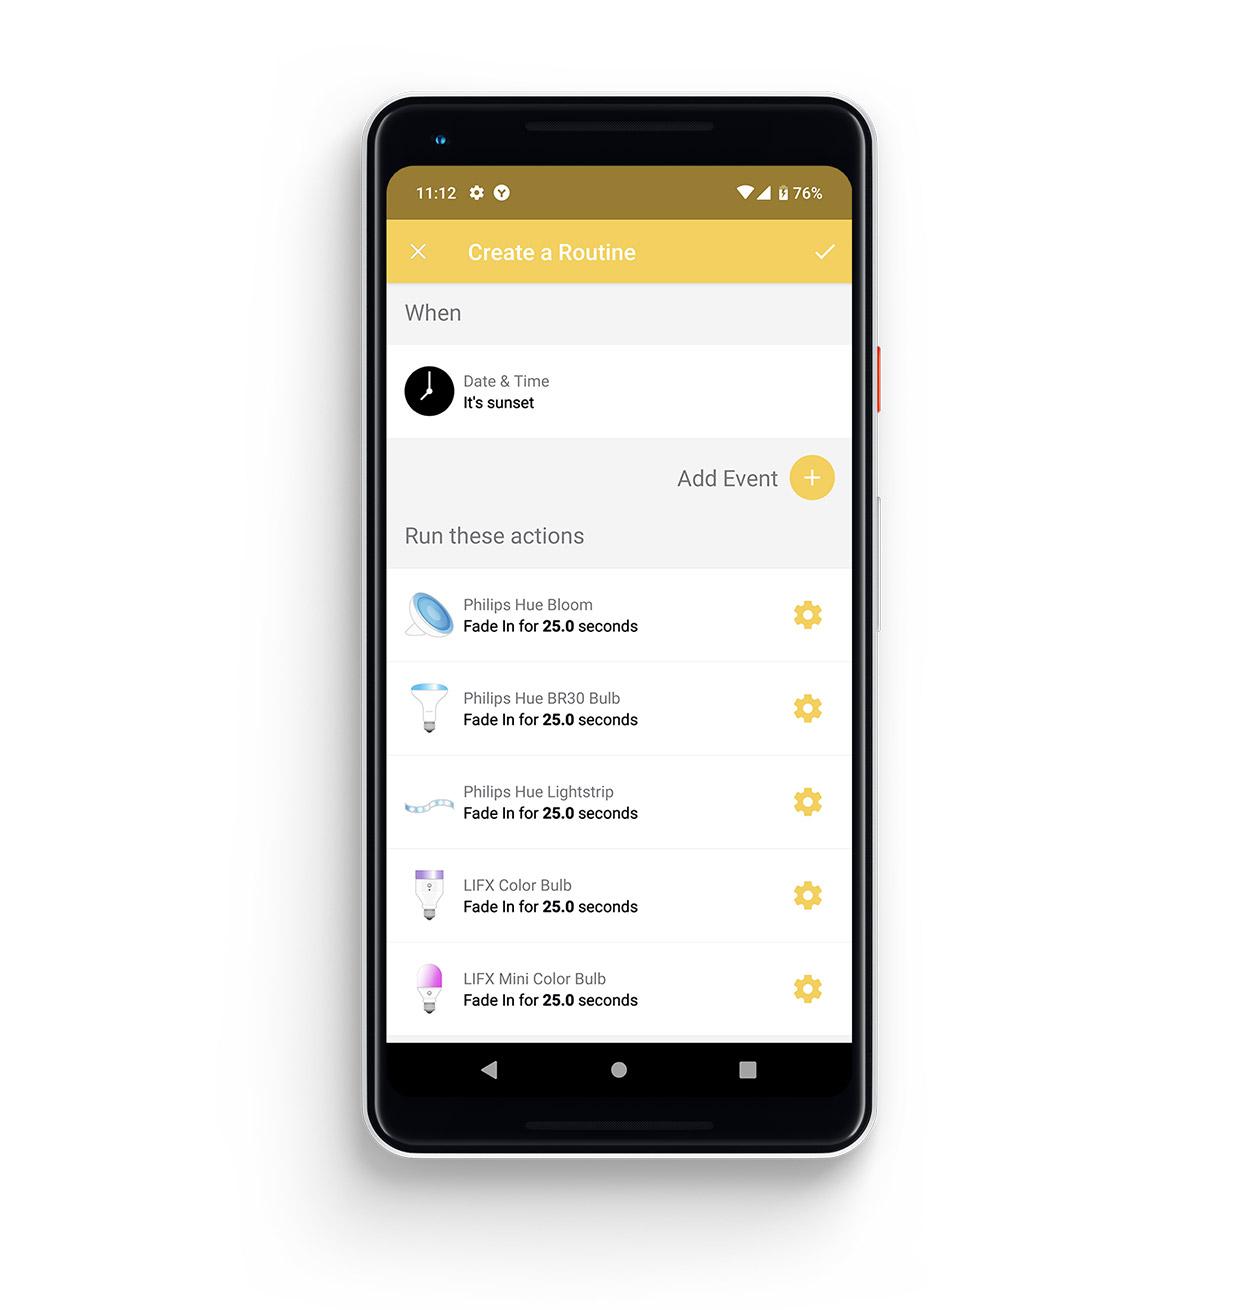 Yonomi - Yonomi App Android Routines Sunset.jpg